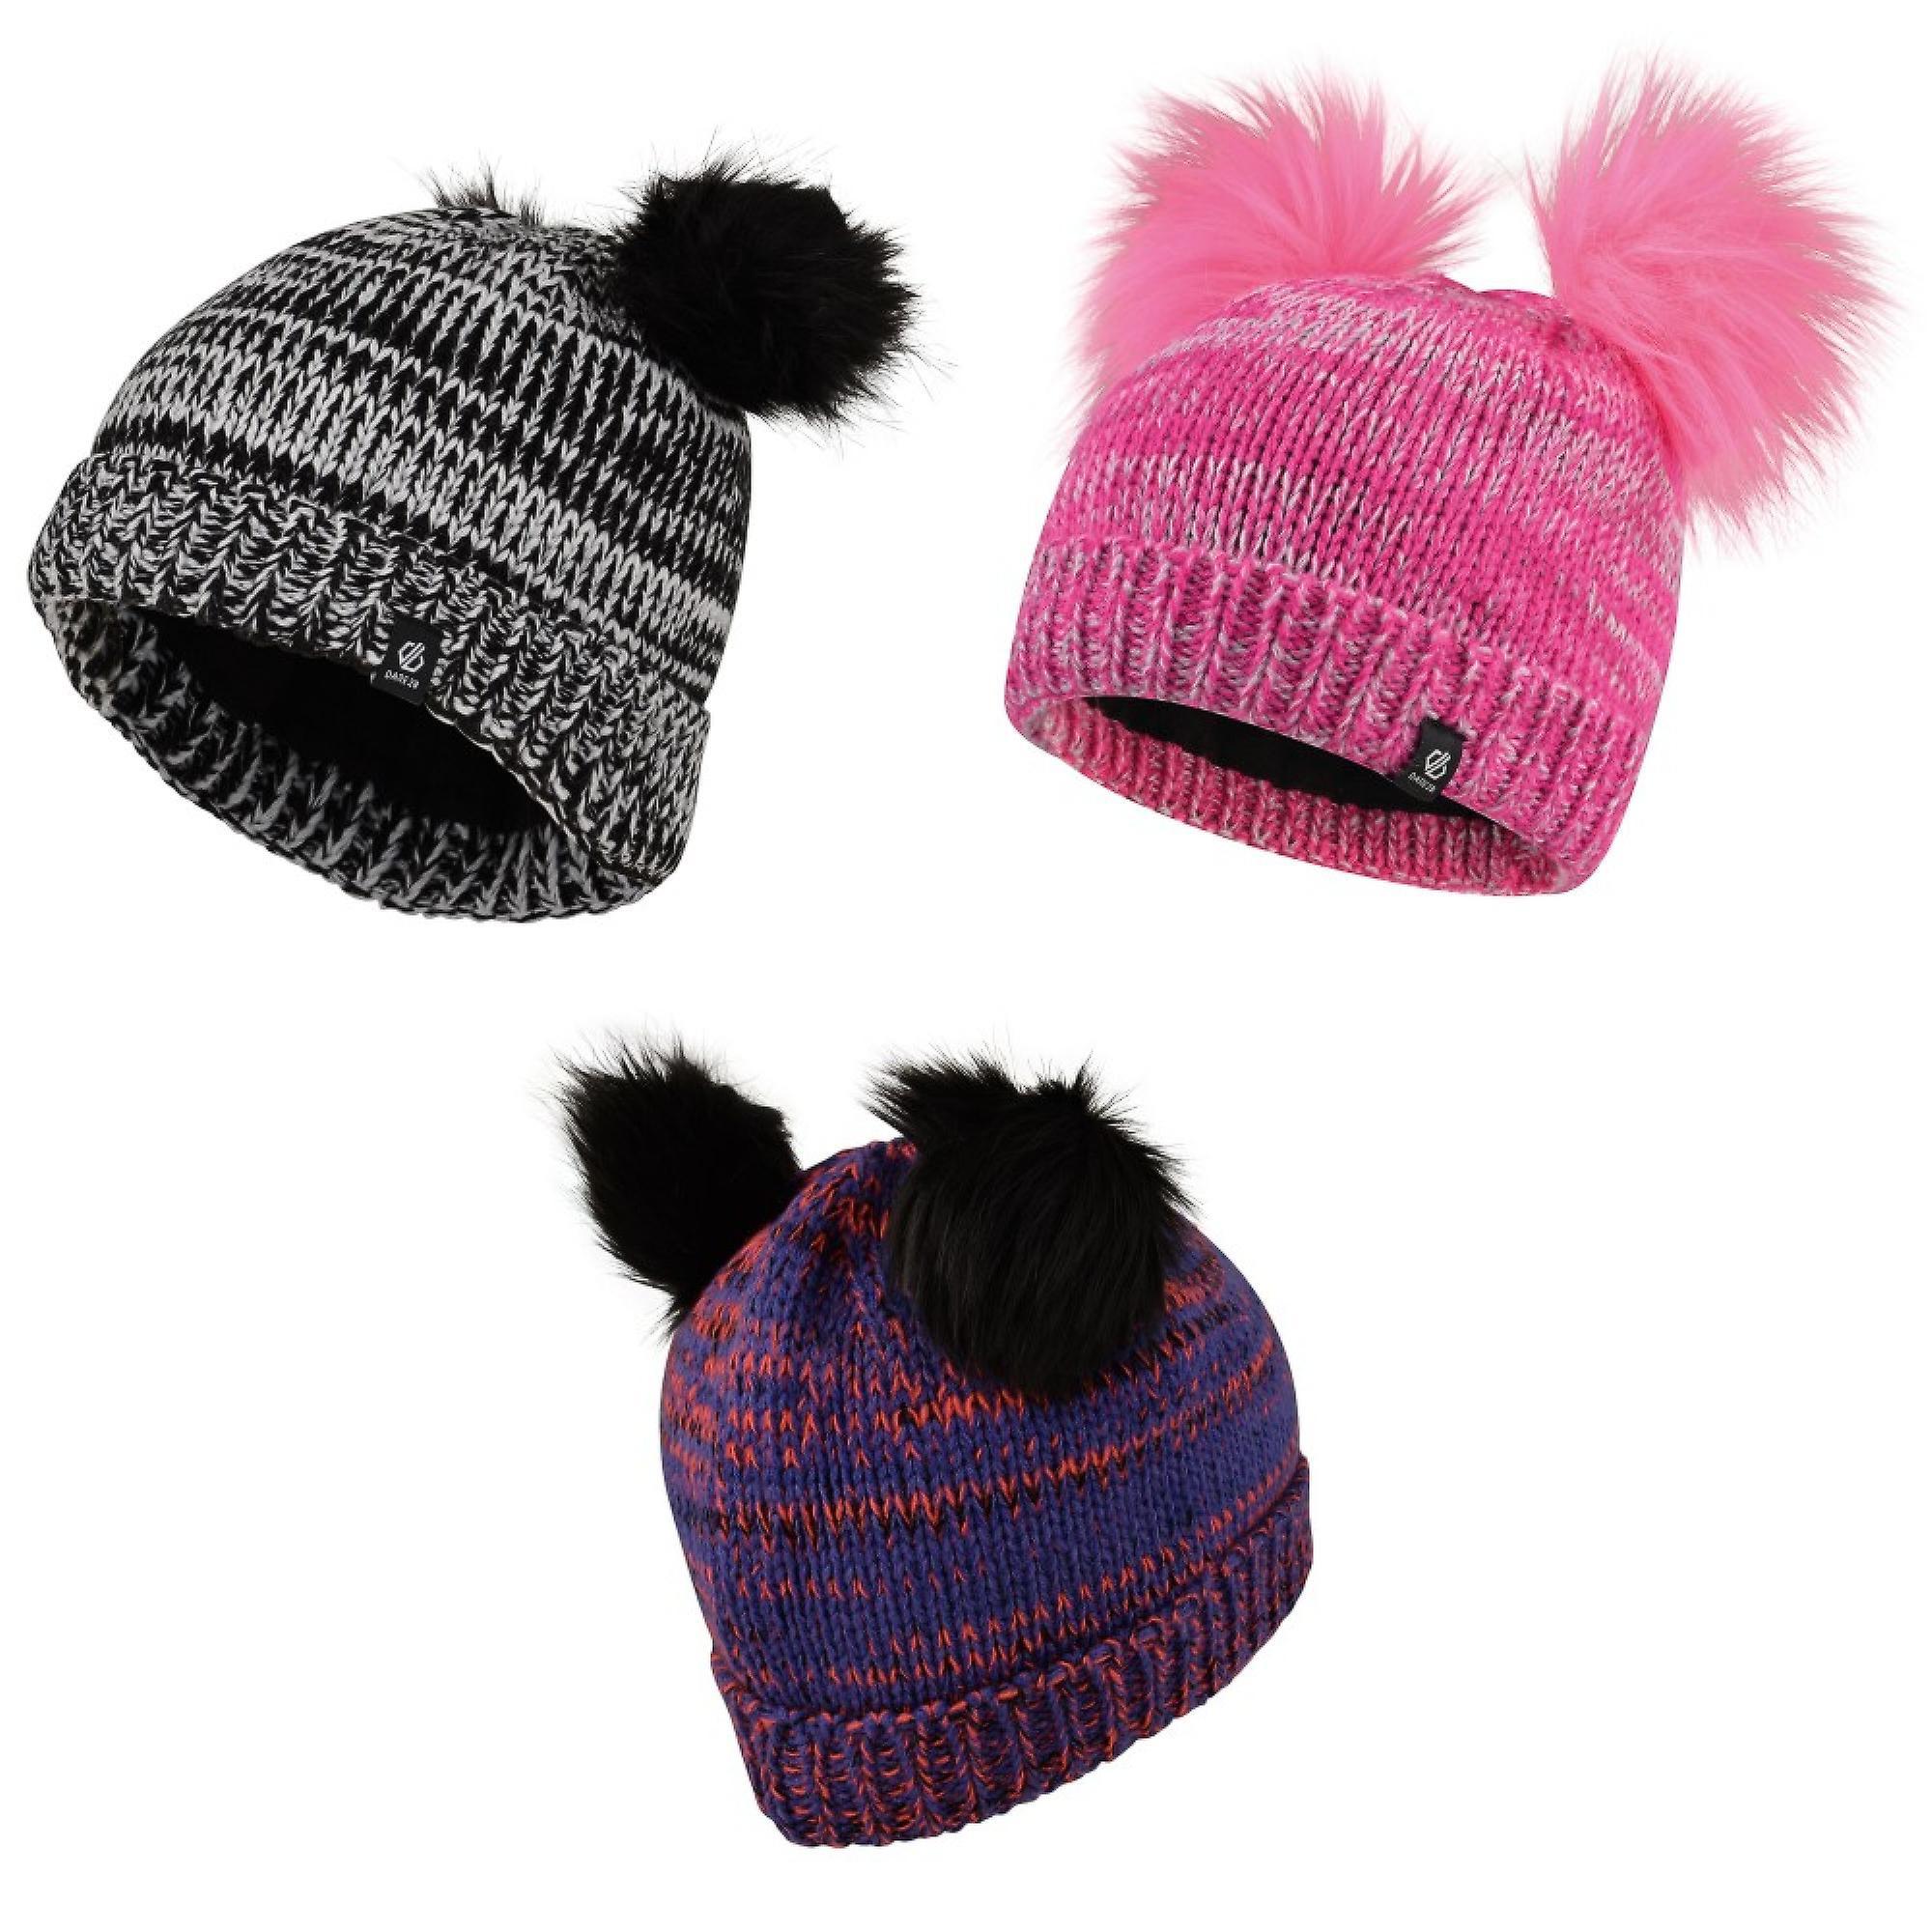 Men//Women Vintage 1970s Gordon Setter Dog Outdoor Fashion Knit Beanies Hat Soft Winter Skull Caps